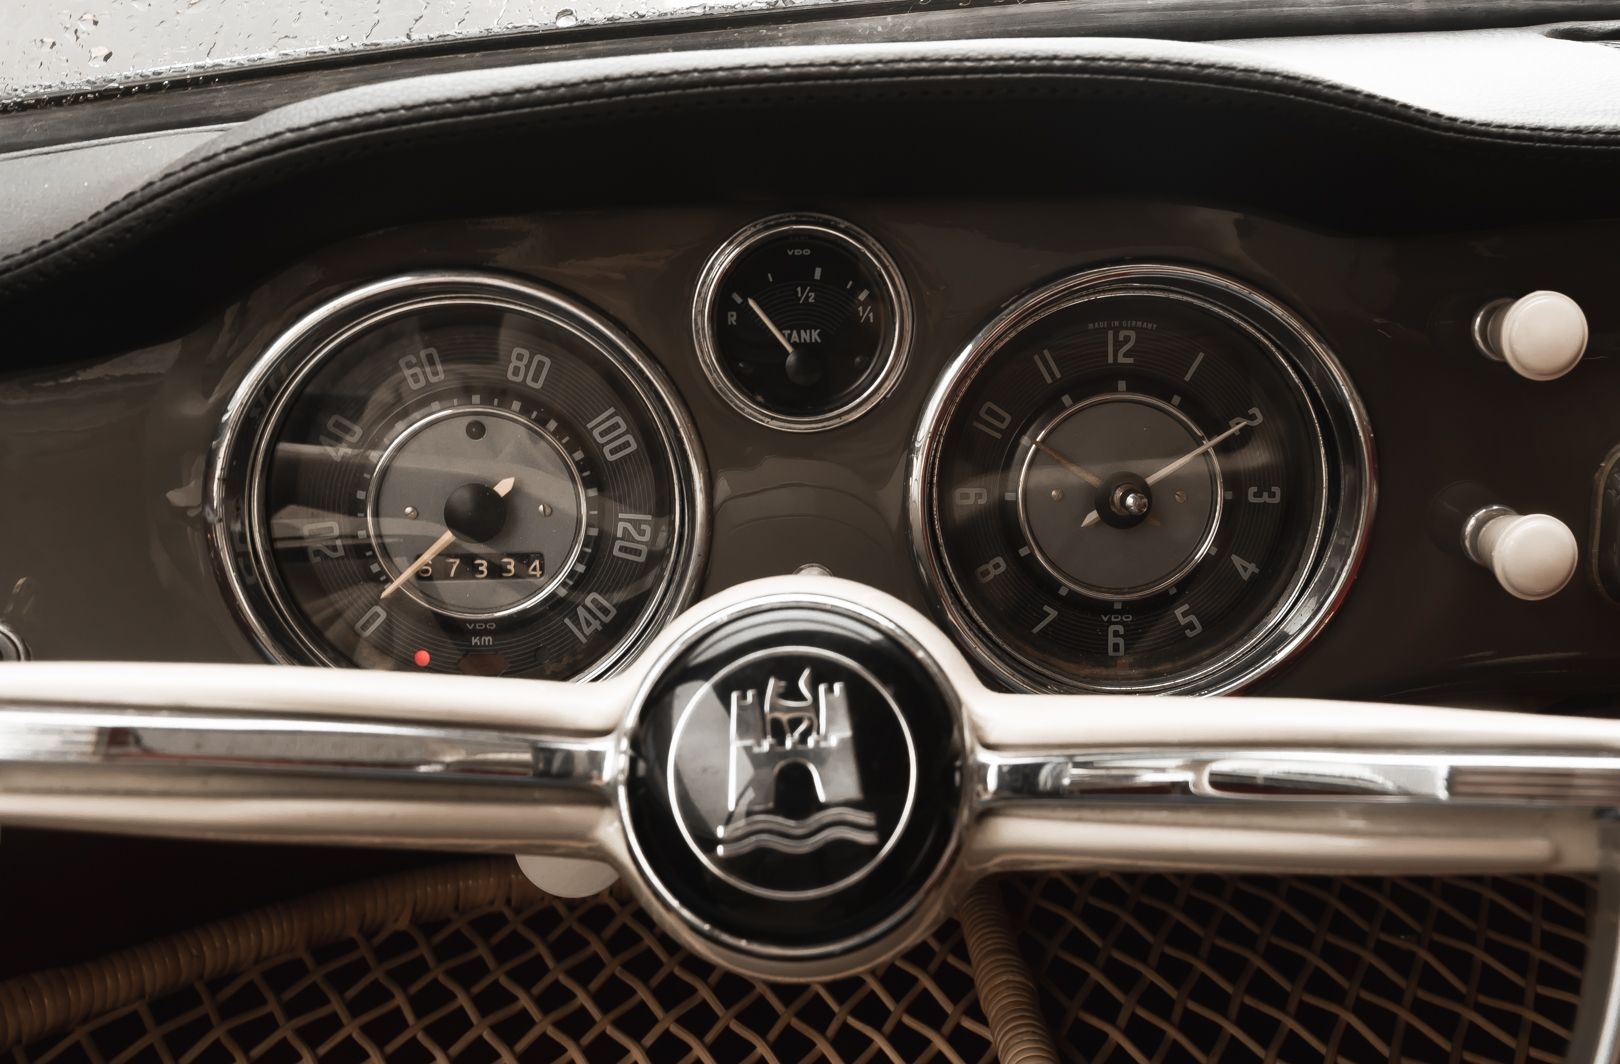 1961 Volkswagen Karmann Ghia 81153